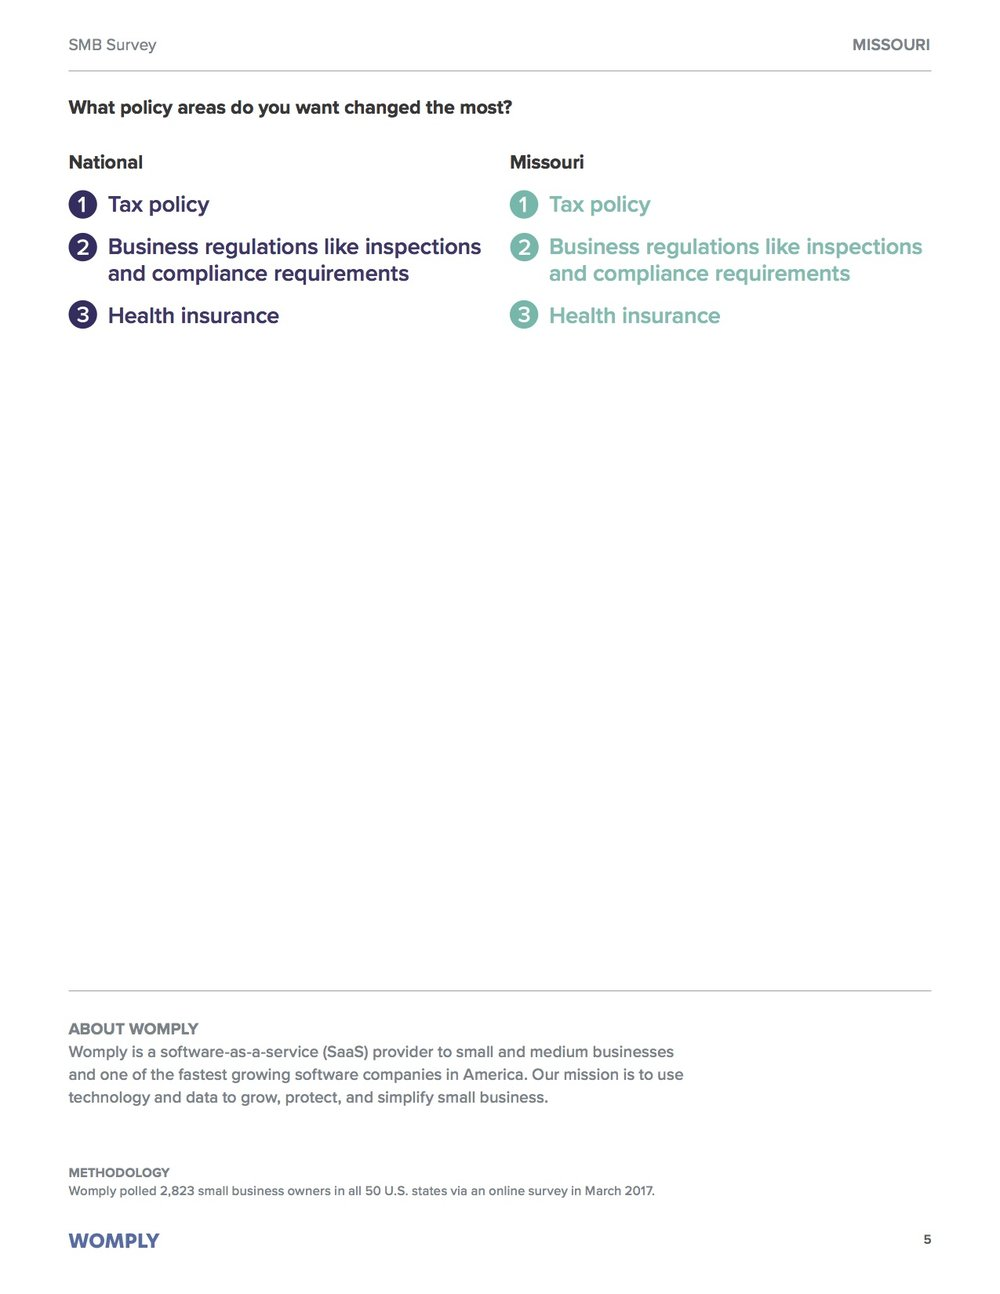 missouri-small-business-optimism-study-5